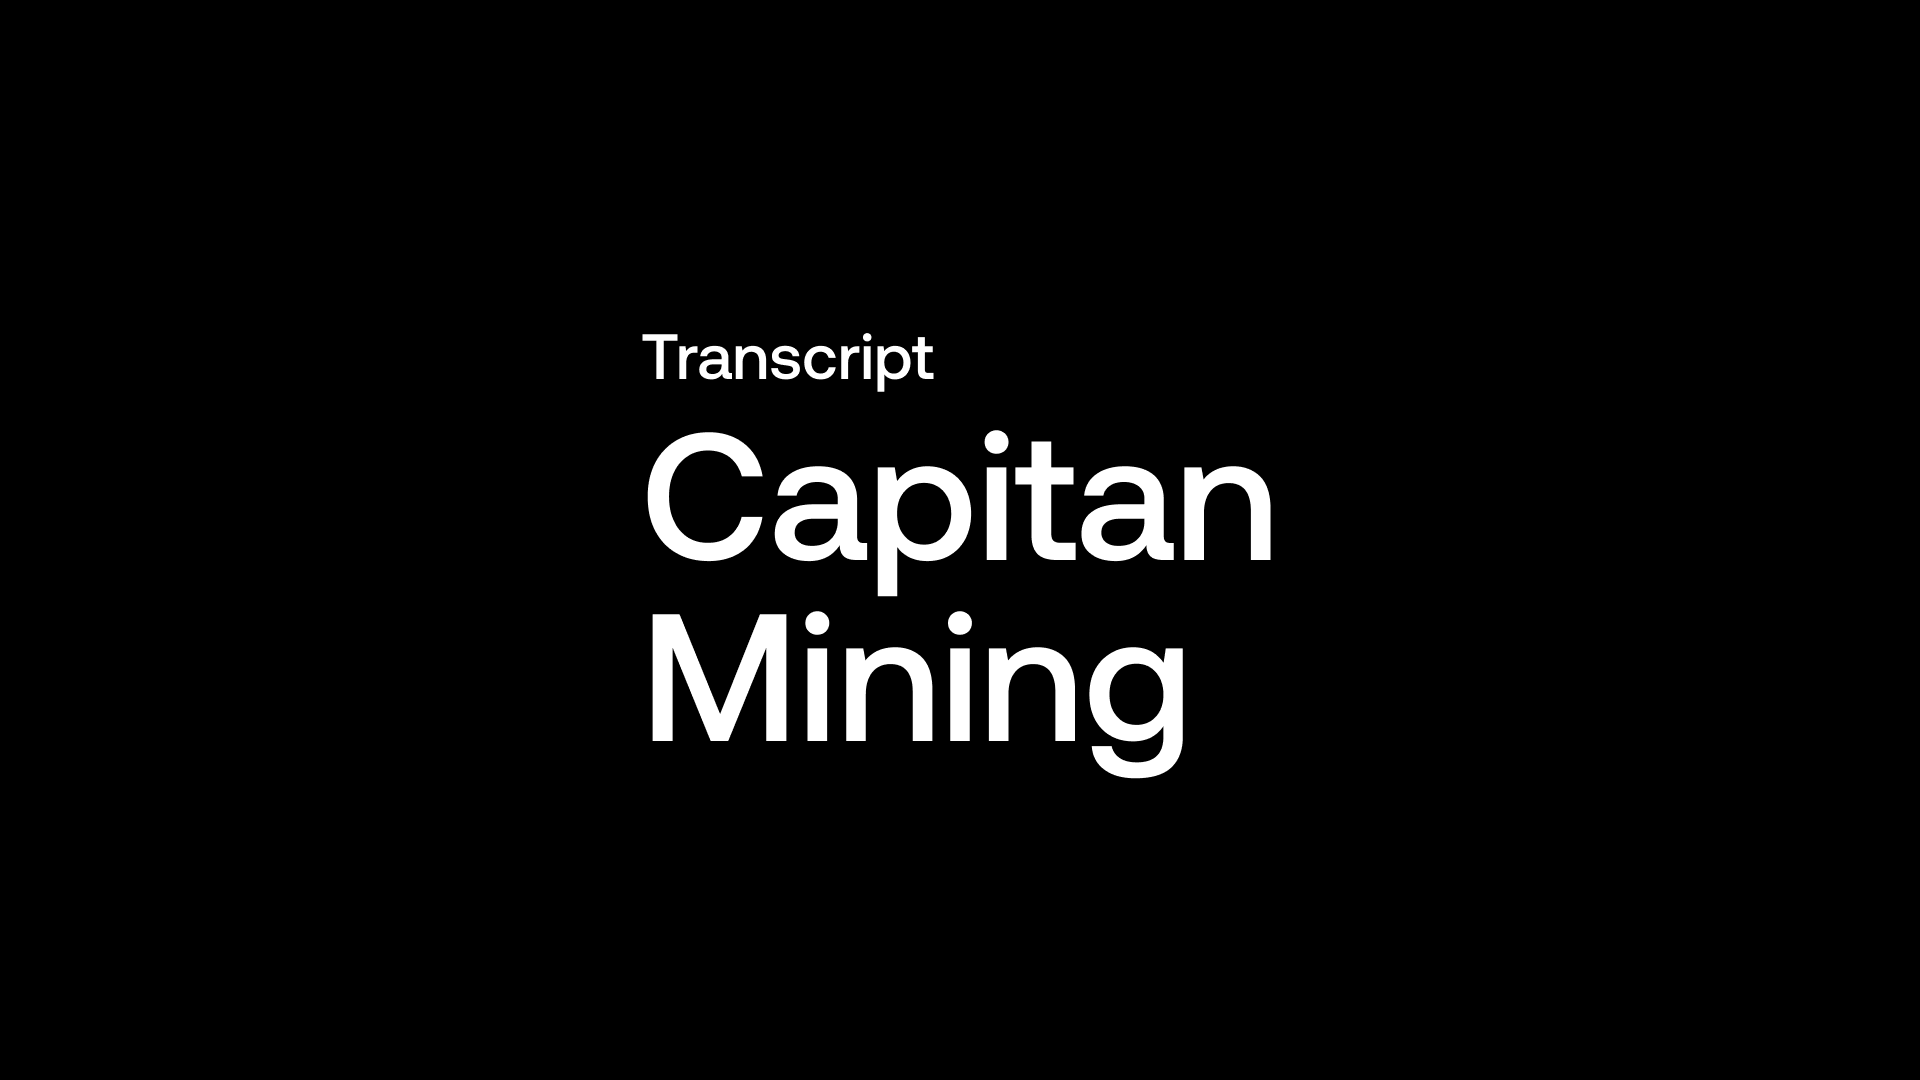 Transcript: Capitan Mining (CAPT) - High-Grade Silver & Gold with Big Backer